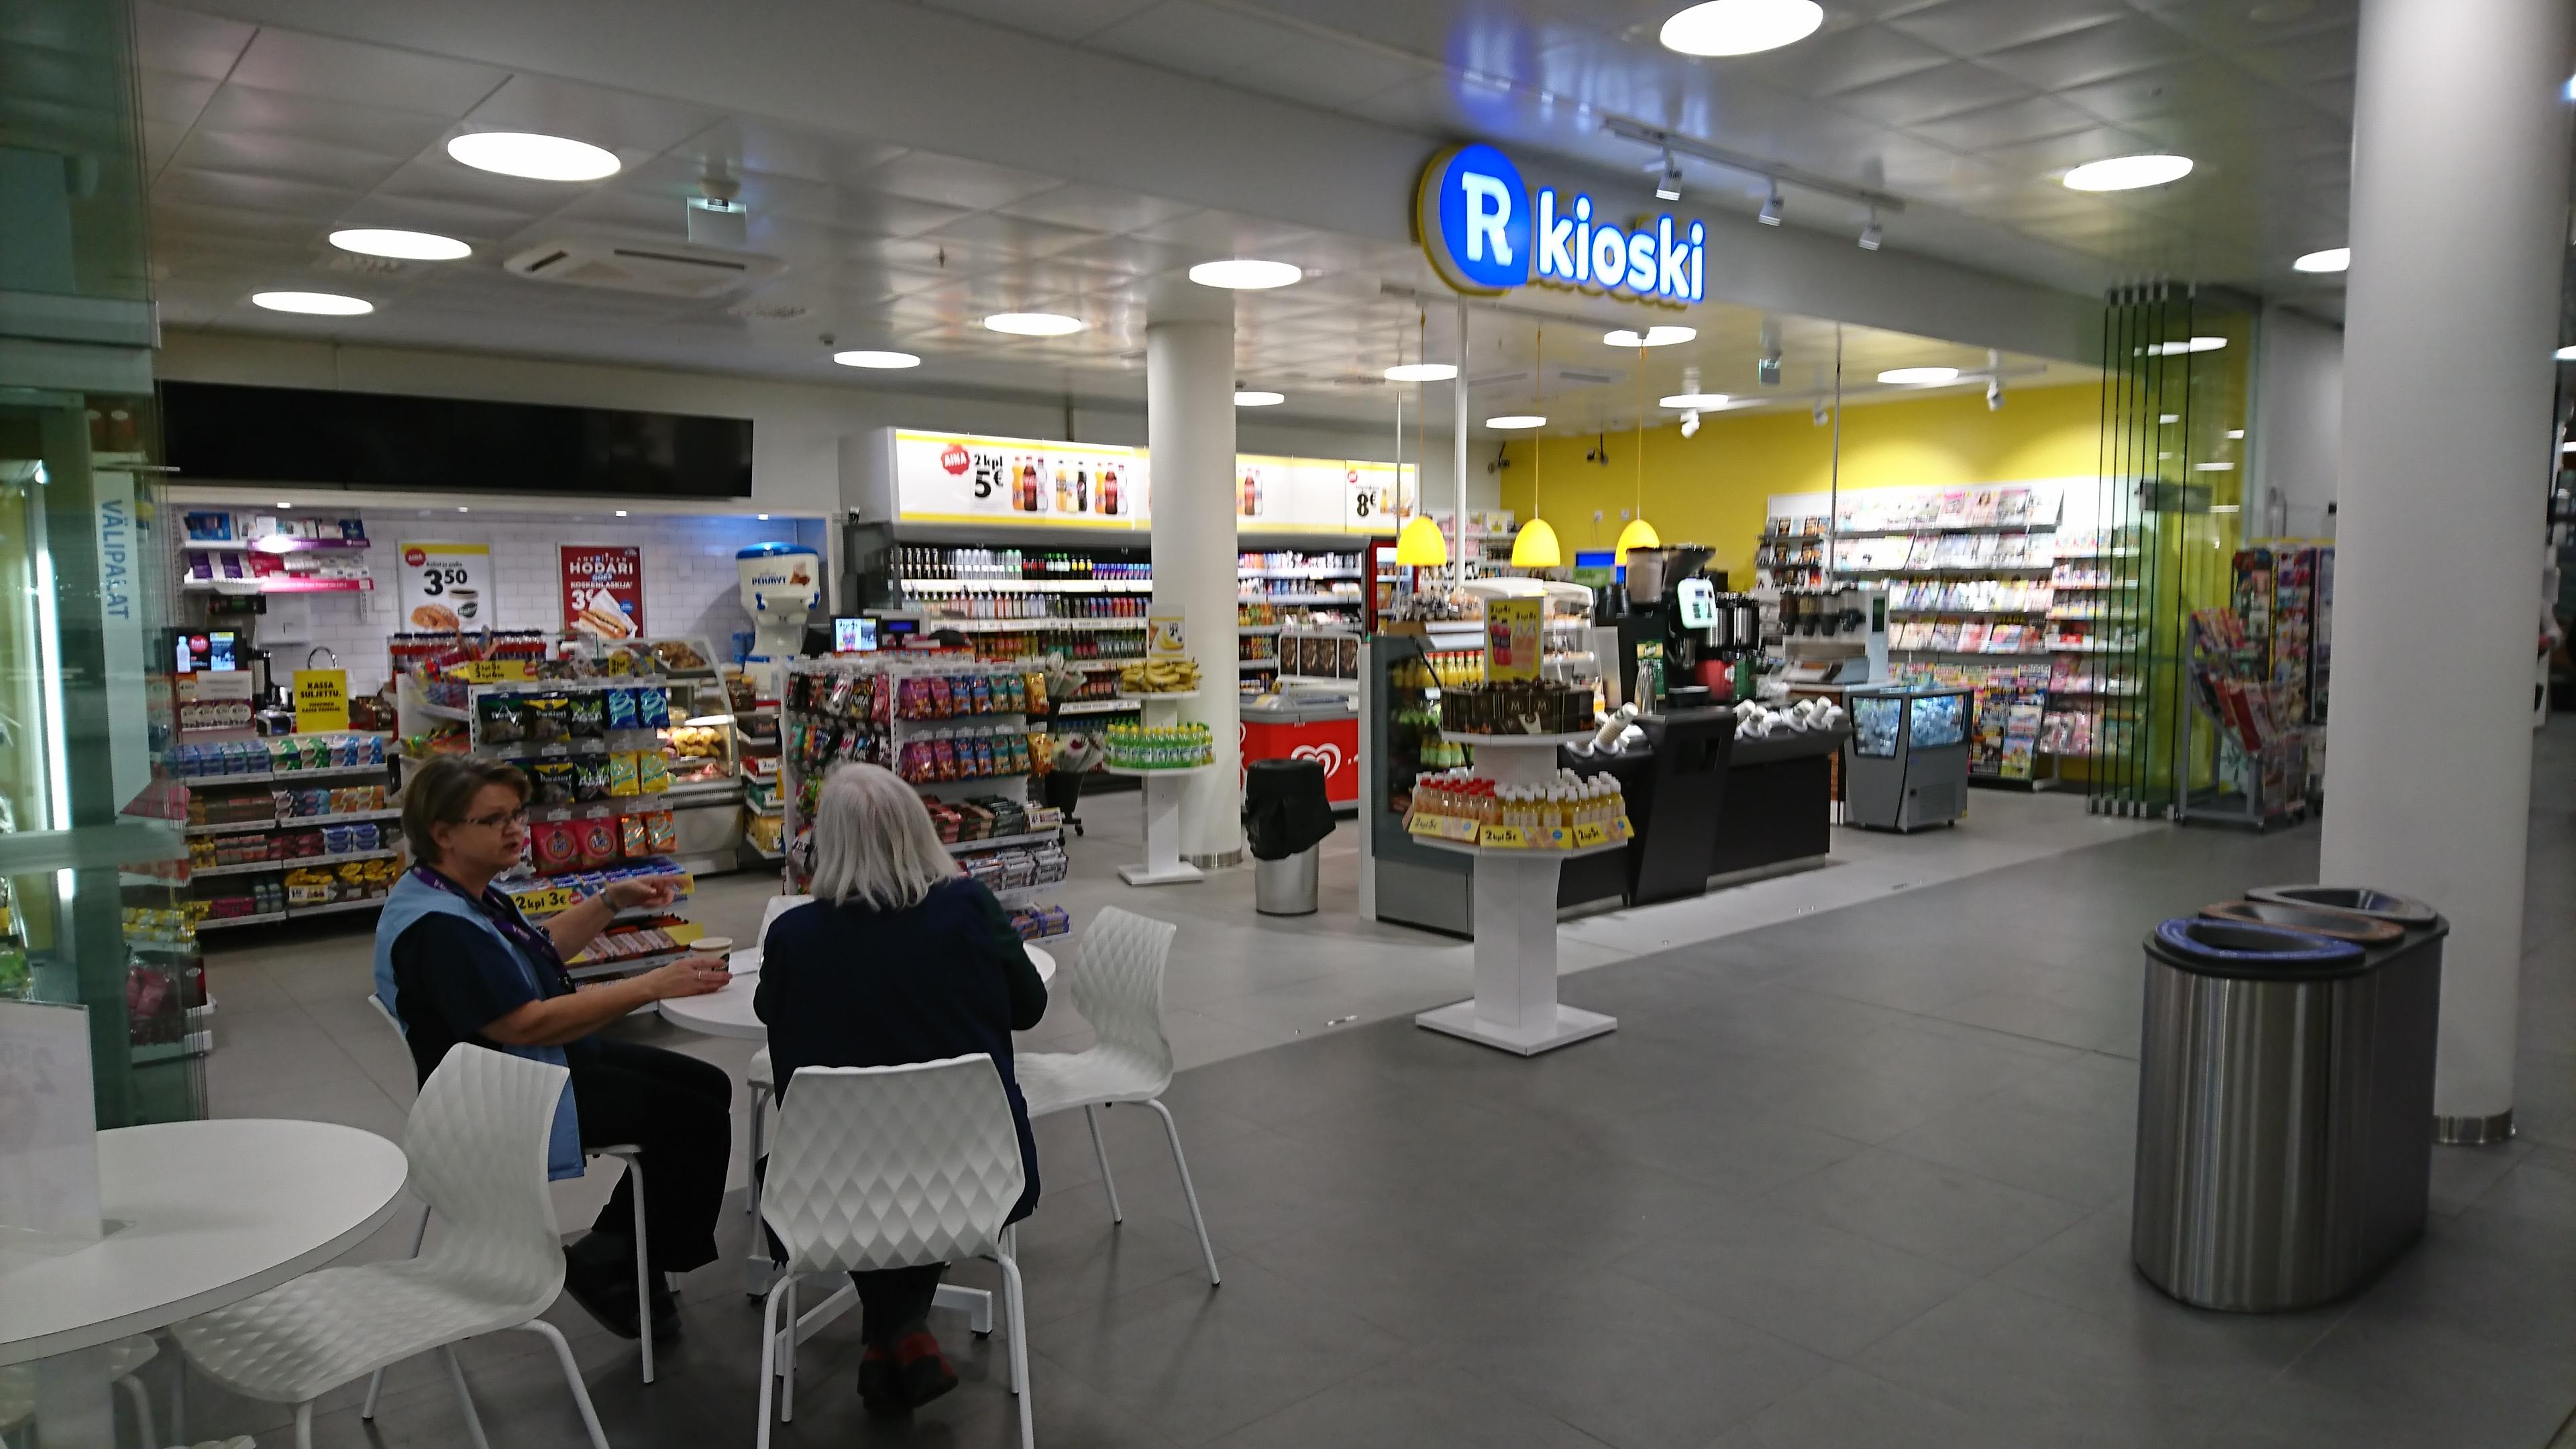 R Kioski